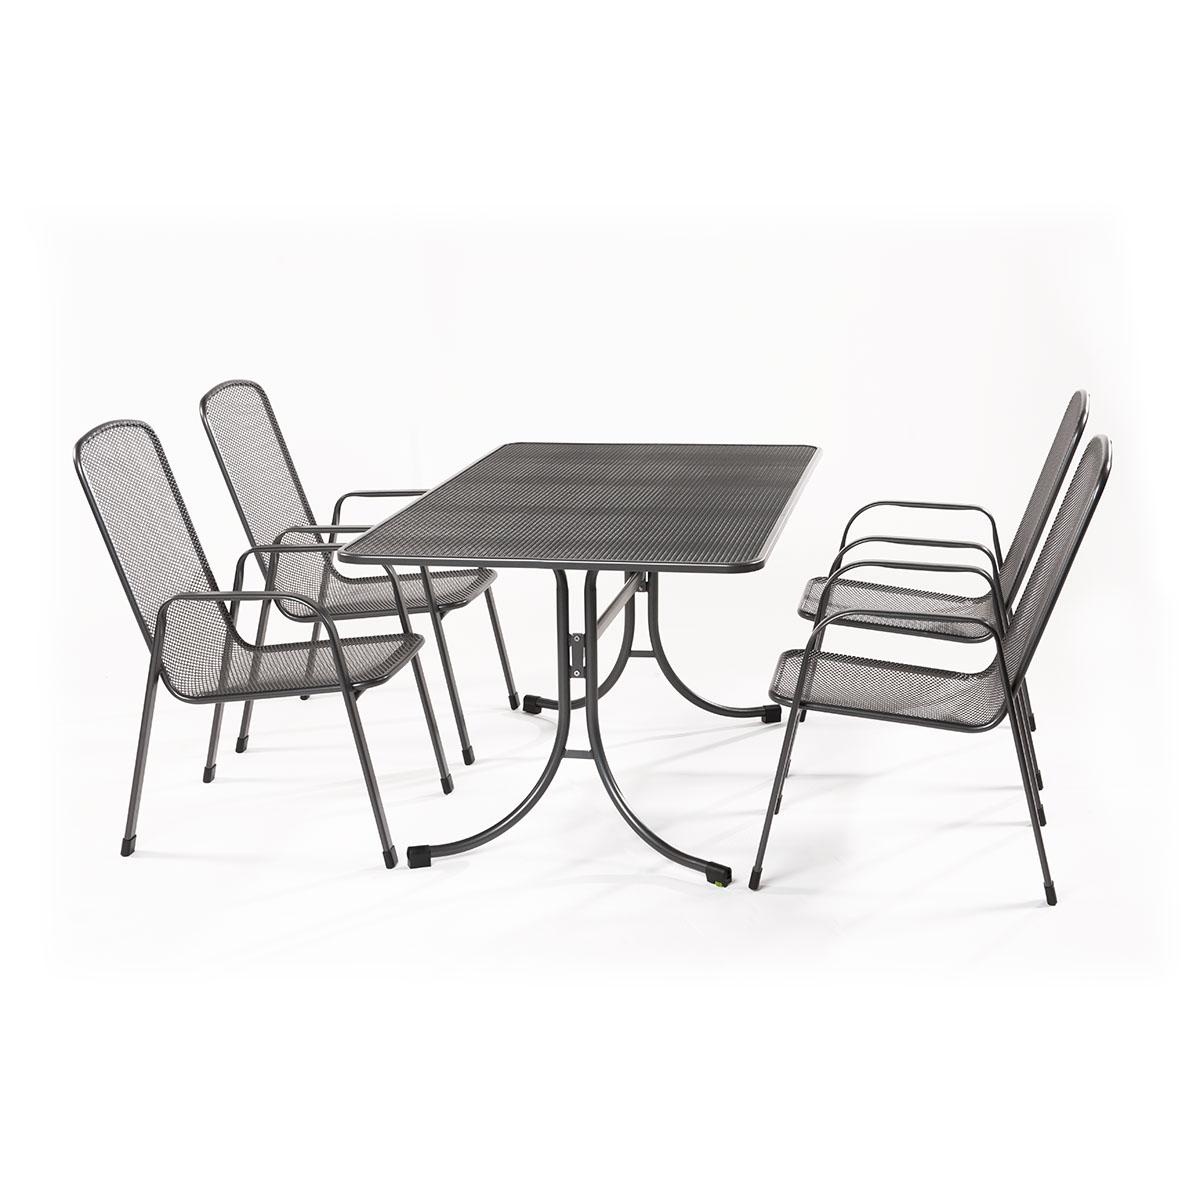 MWH Bani 4+, sestava nábytku z tahokovu (4x židle Savoy Basic, 1x stůl Universal 145)